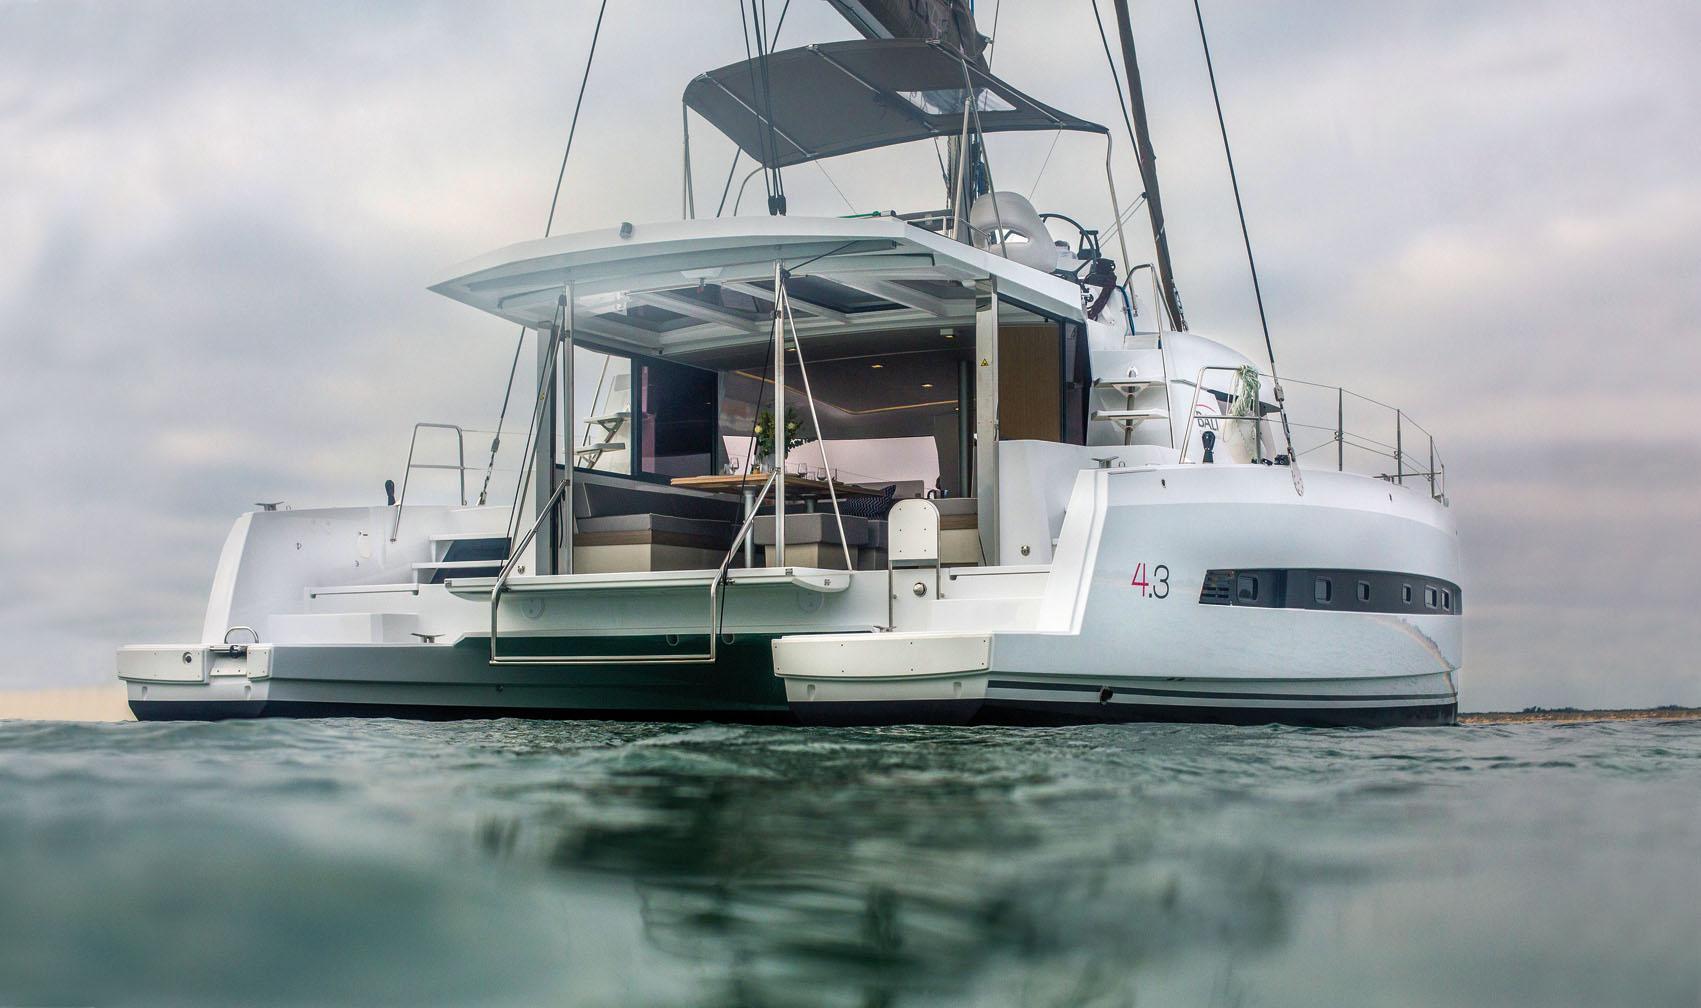 Bali 4.3 Prestige - Catamaran for Charter in Greece